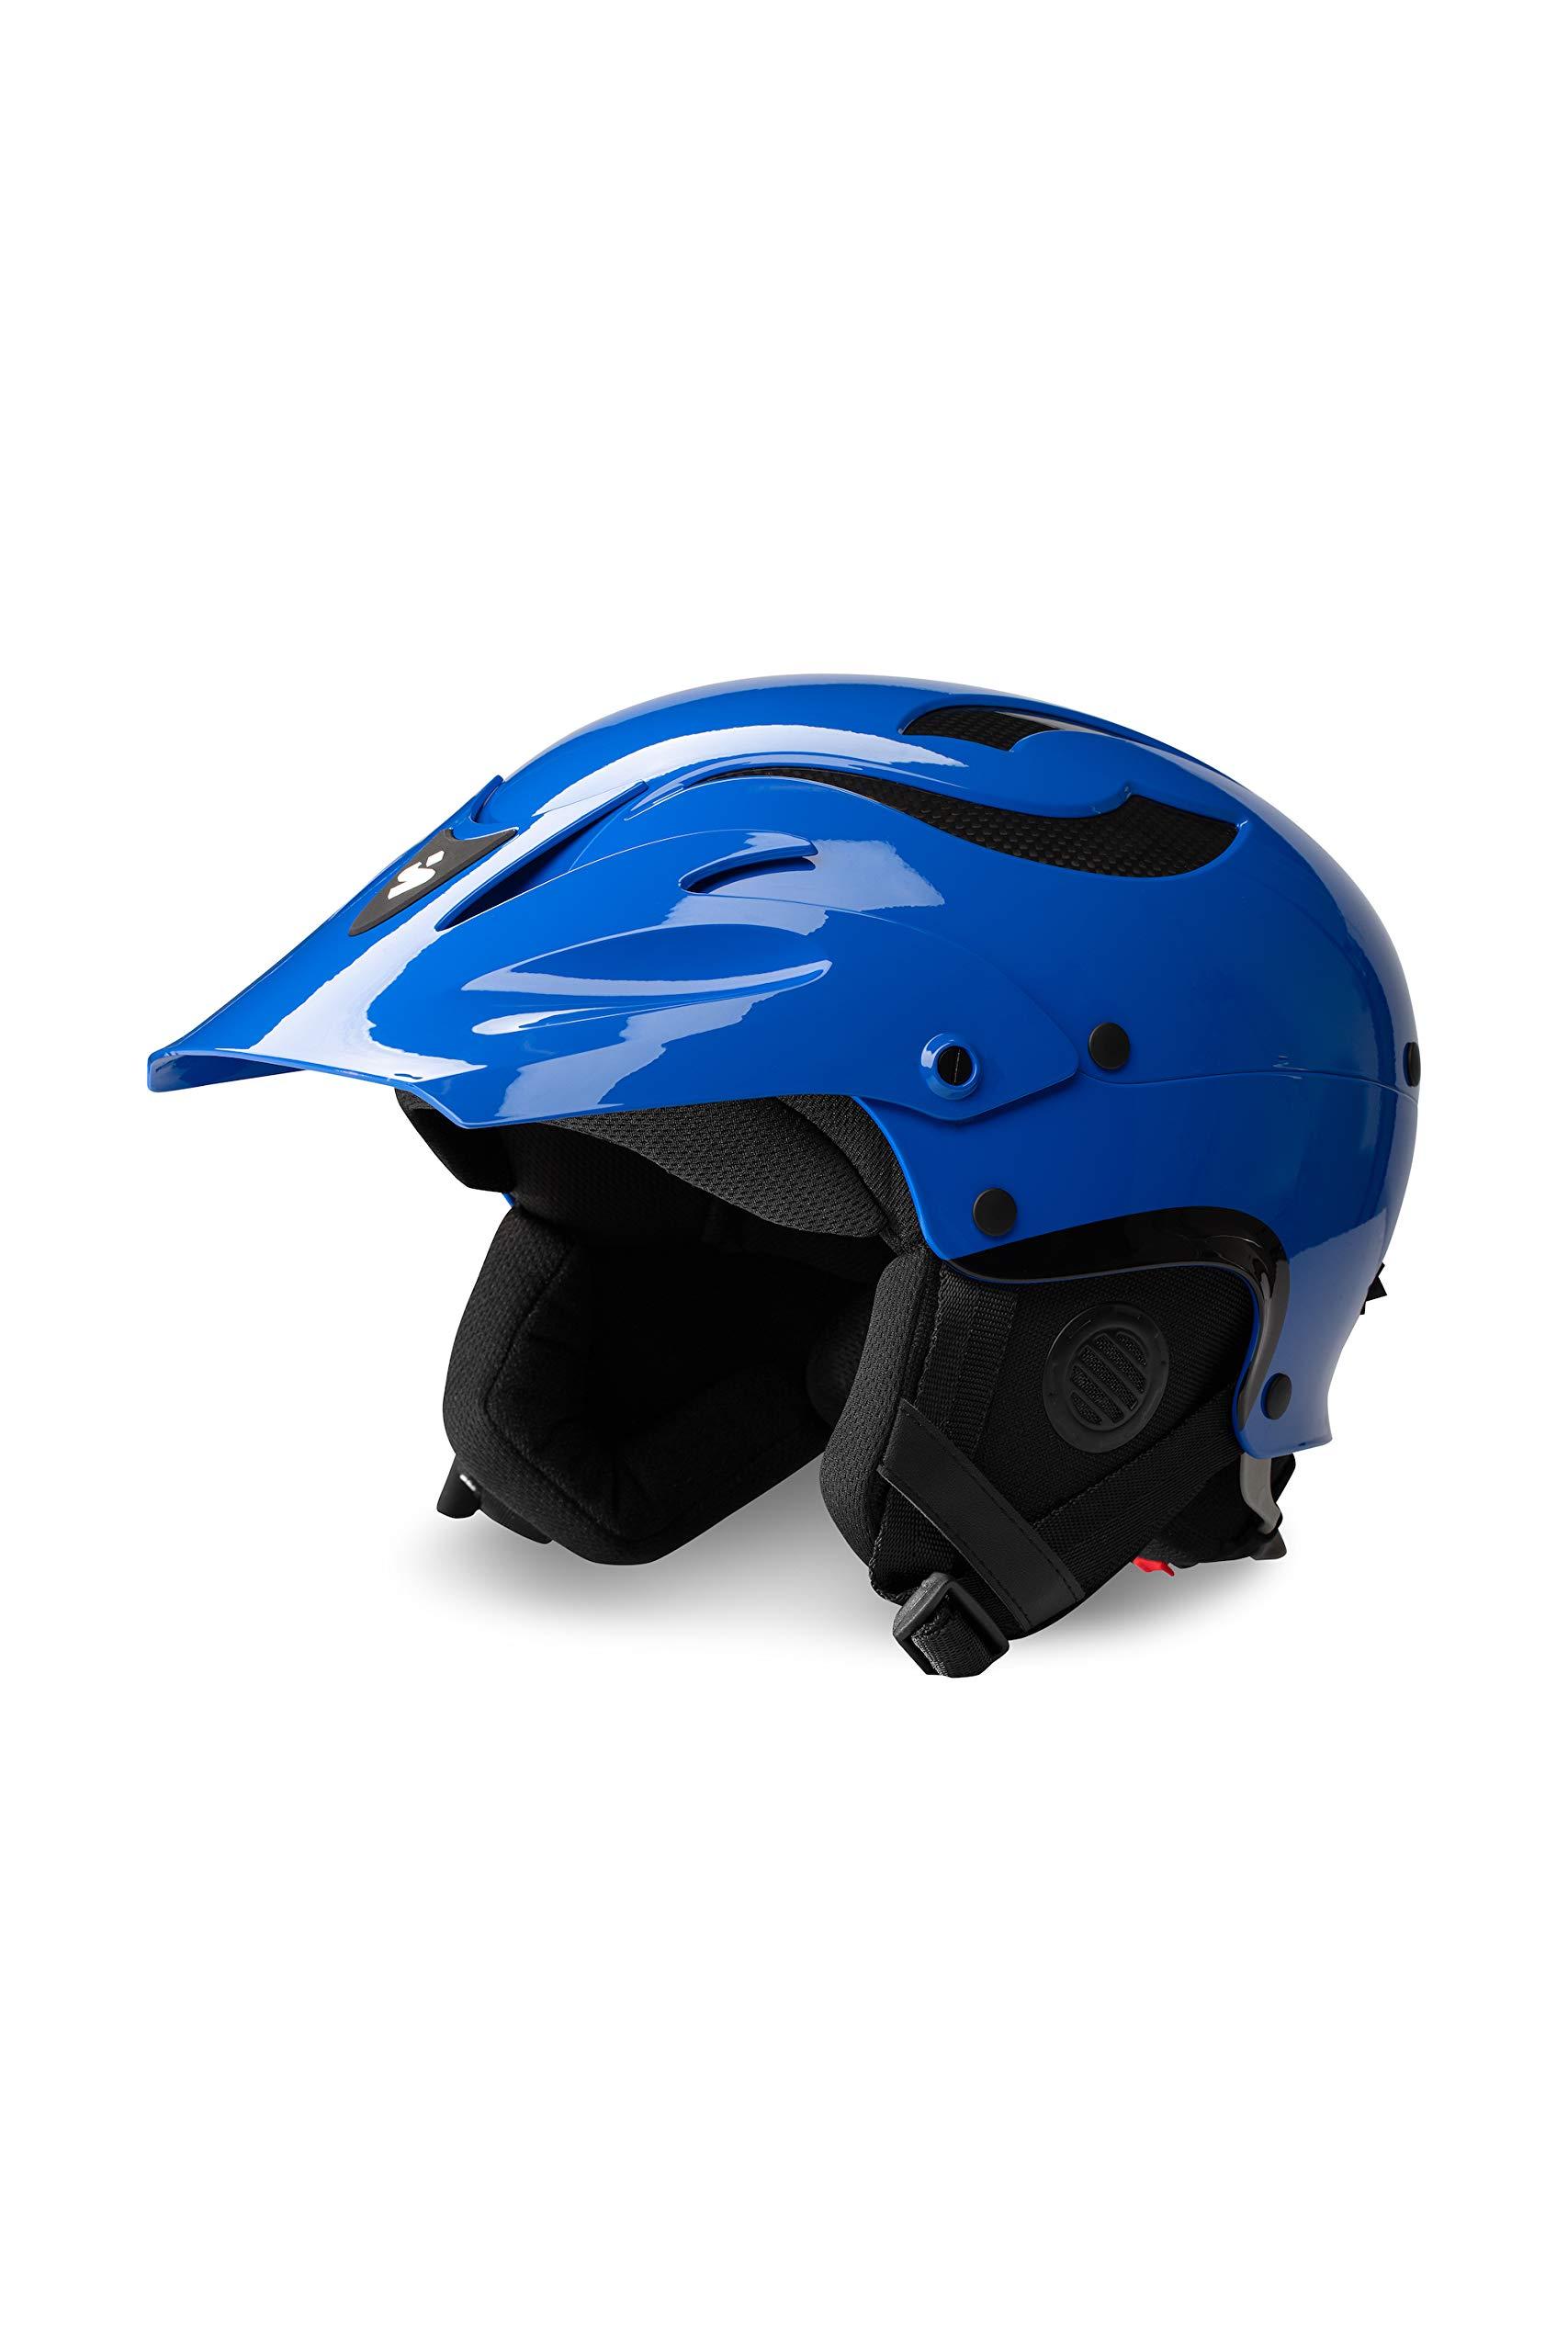 Sweet Protection Rocker Paddle Helmet, Race Blue, ML